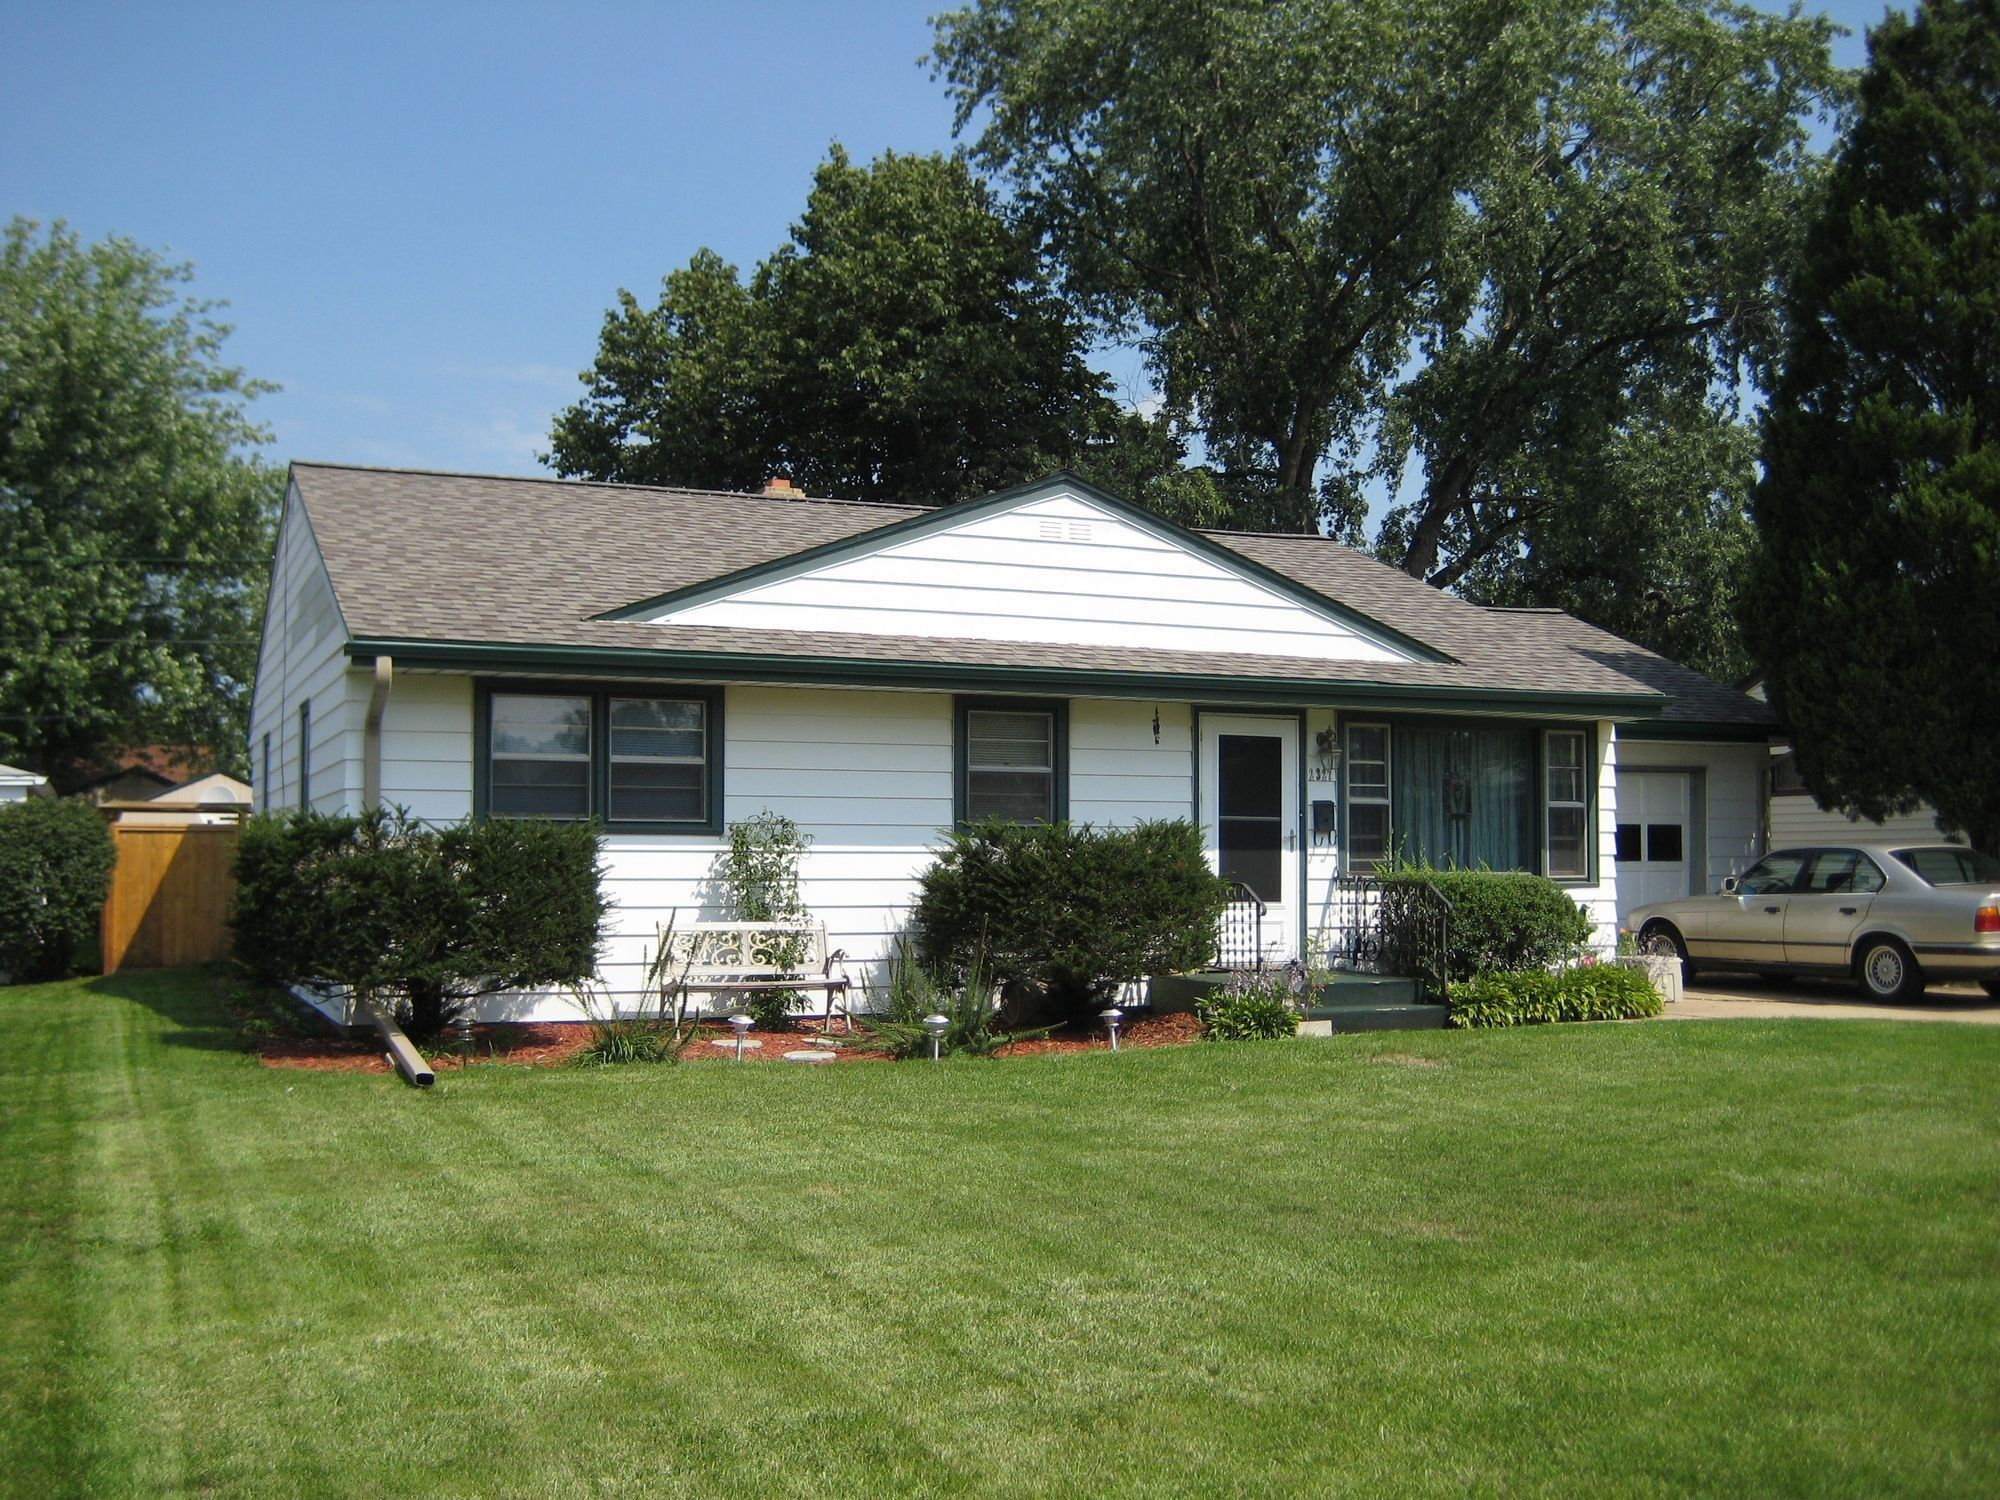 2327 Bell Ave For Sale - Rockford, IL | Trulia